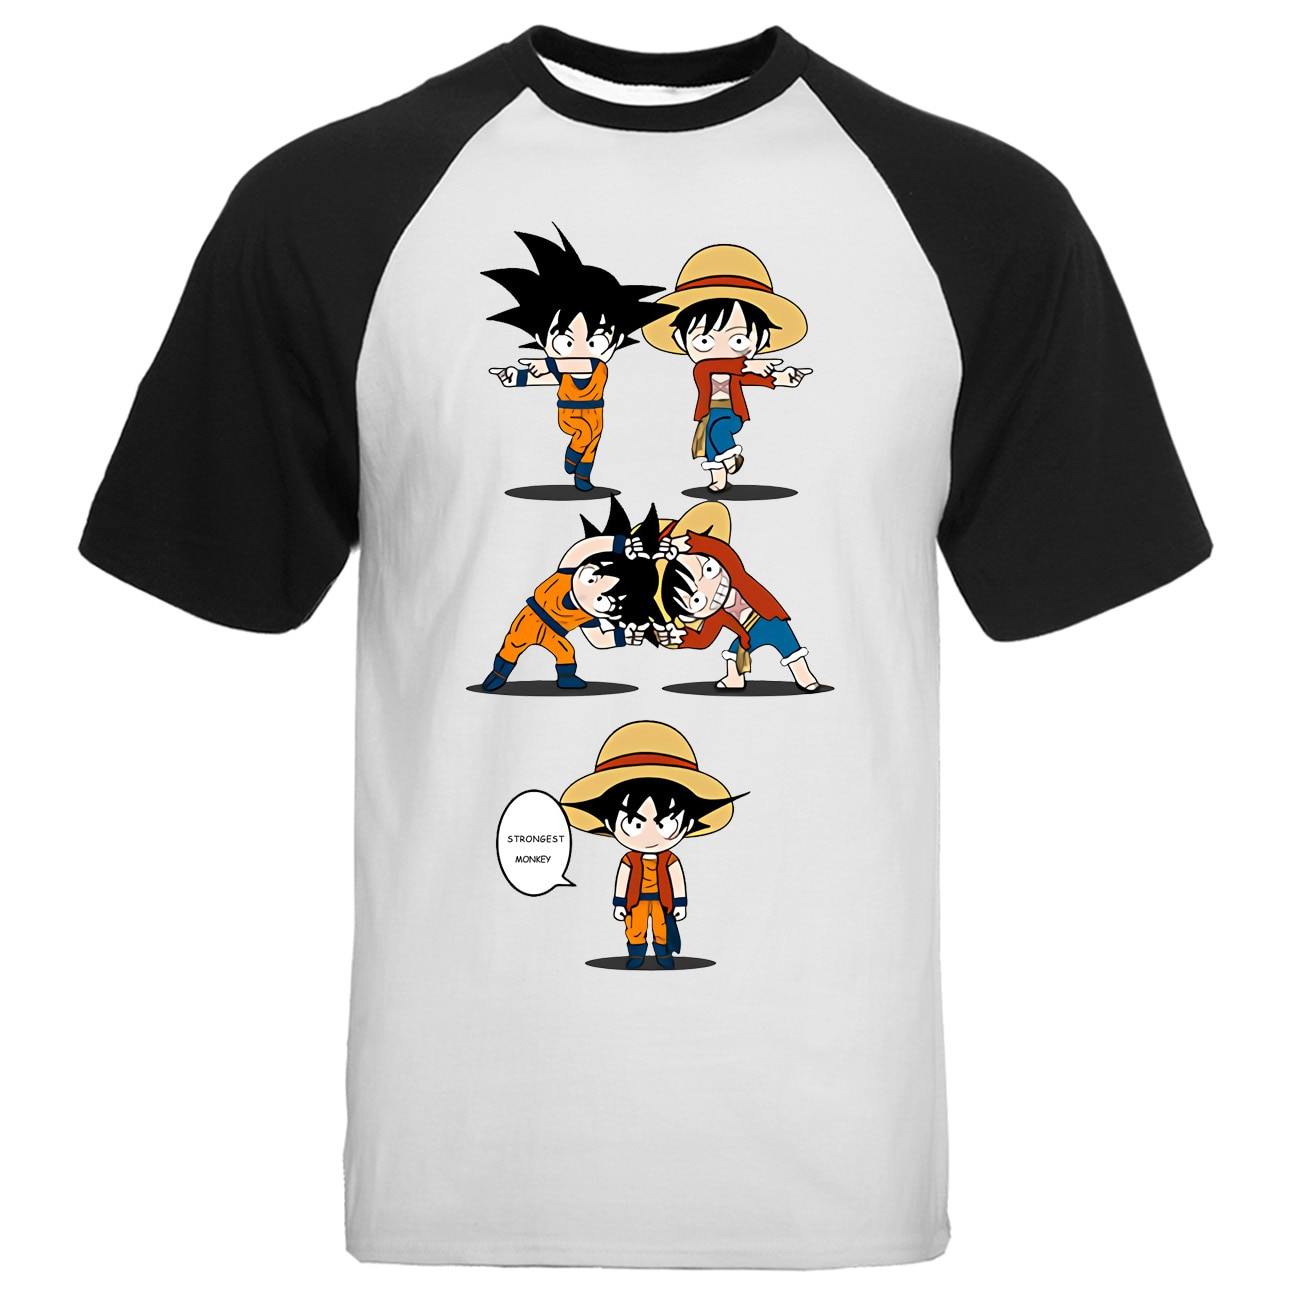 Un golpe hombre Saitama Bola de Dragón T Shirt hombres Raglan divertida fusión verano Camisetas Camiseta de algodón de manga corta Camisetas